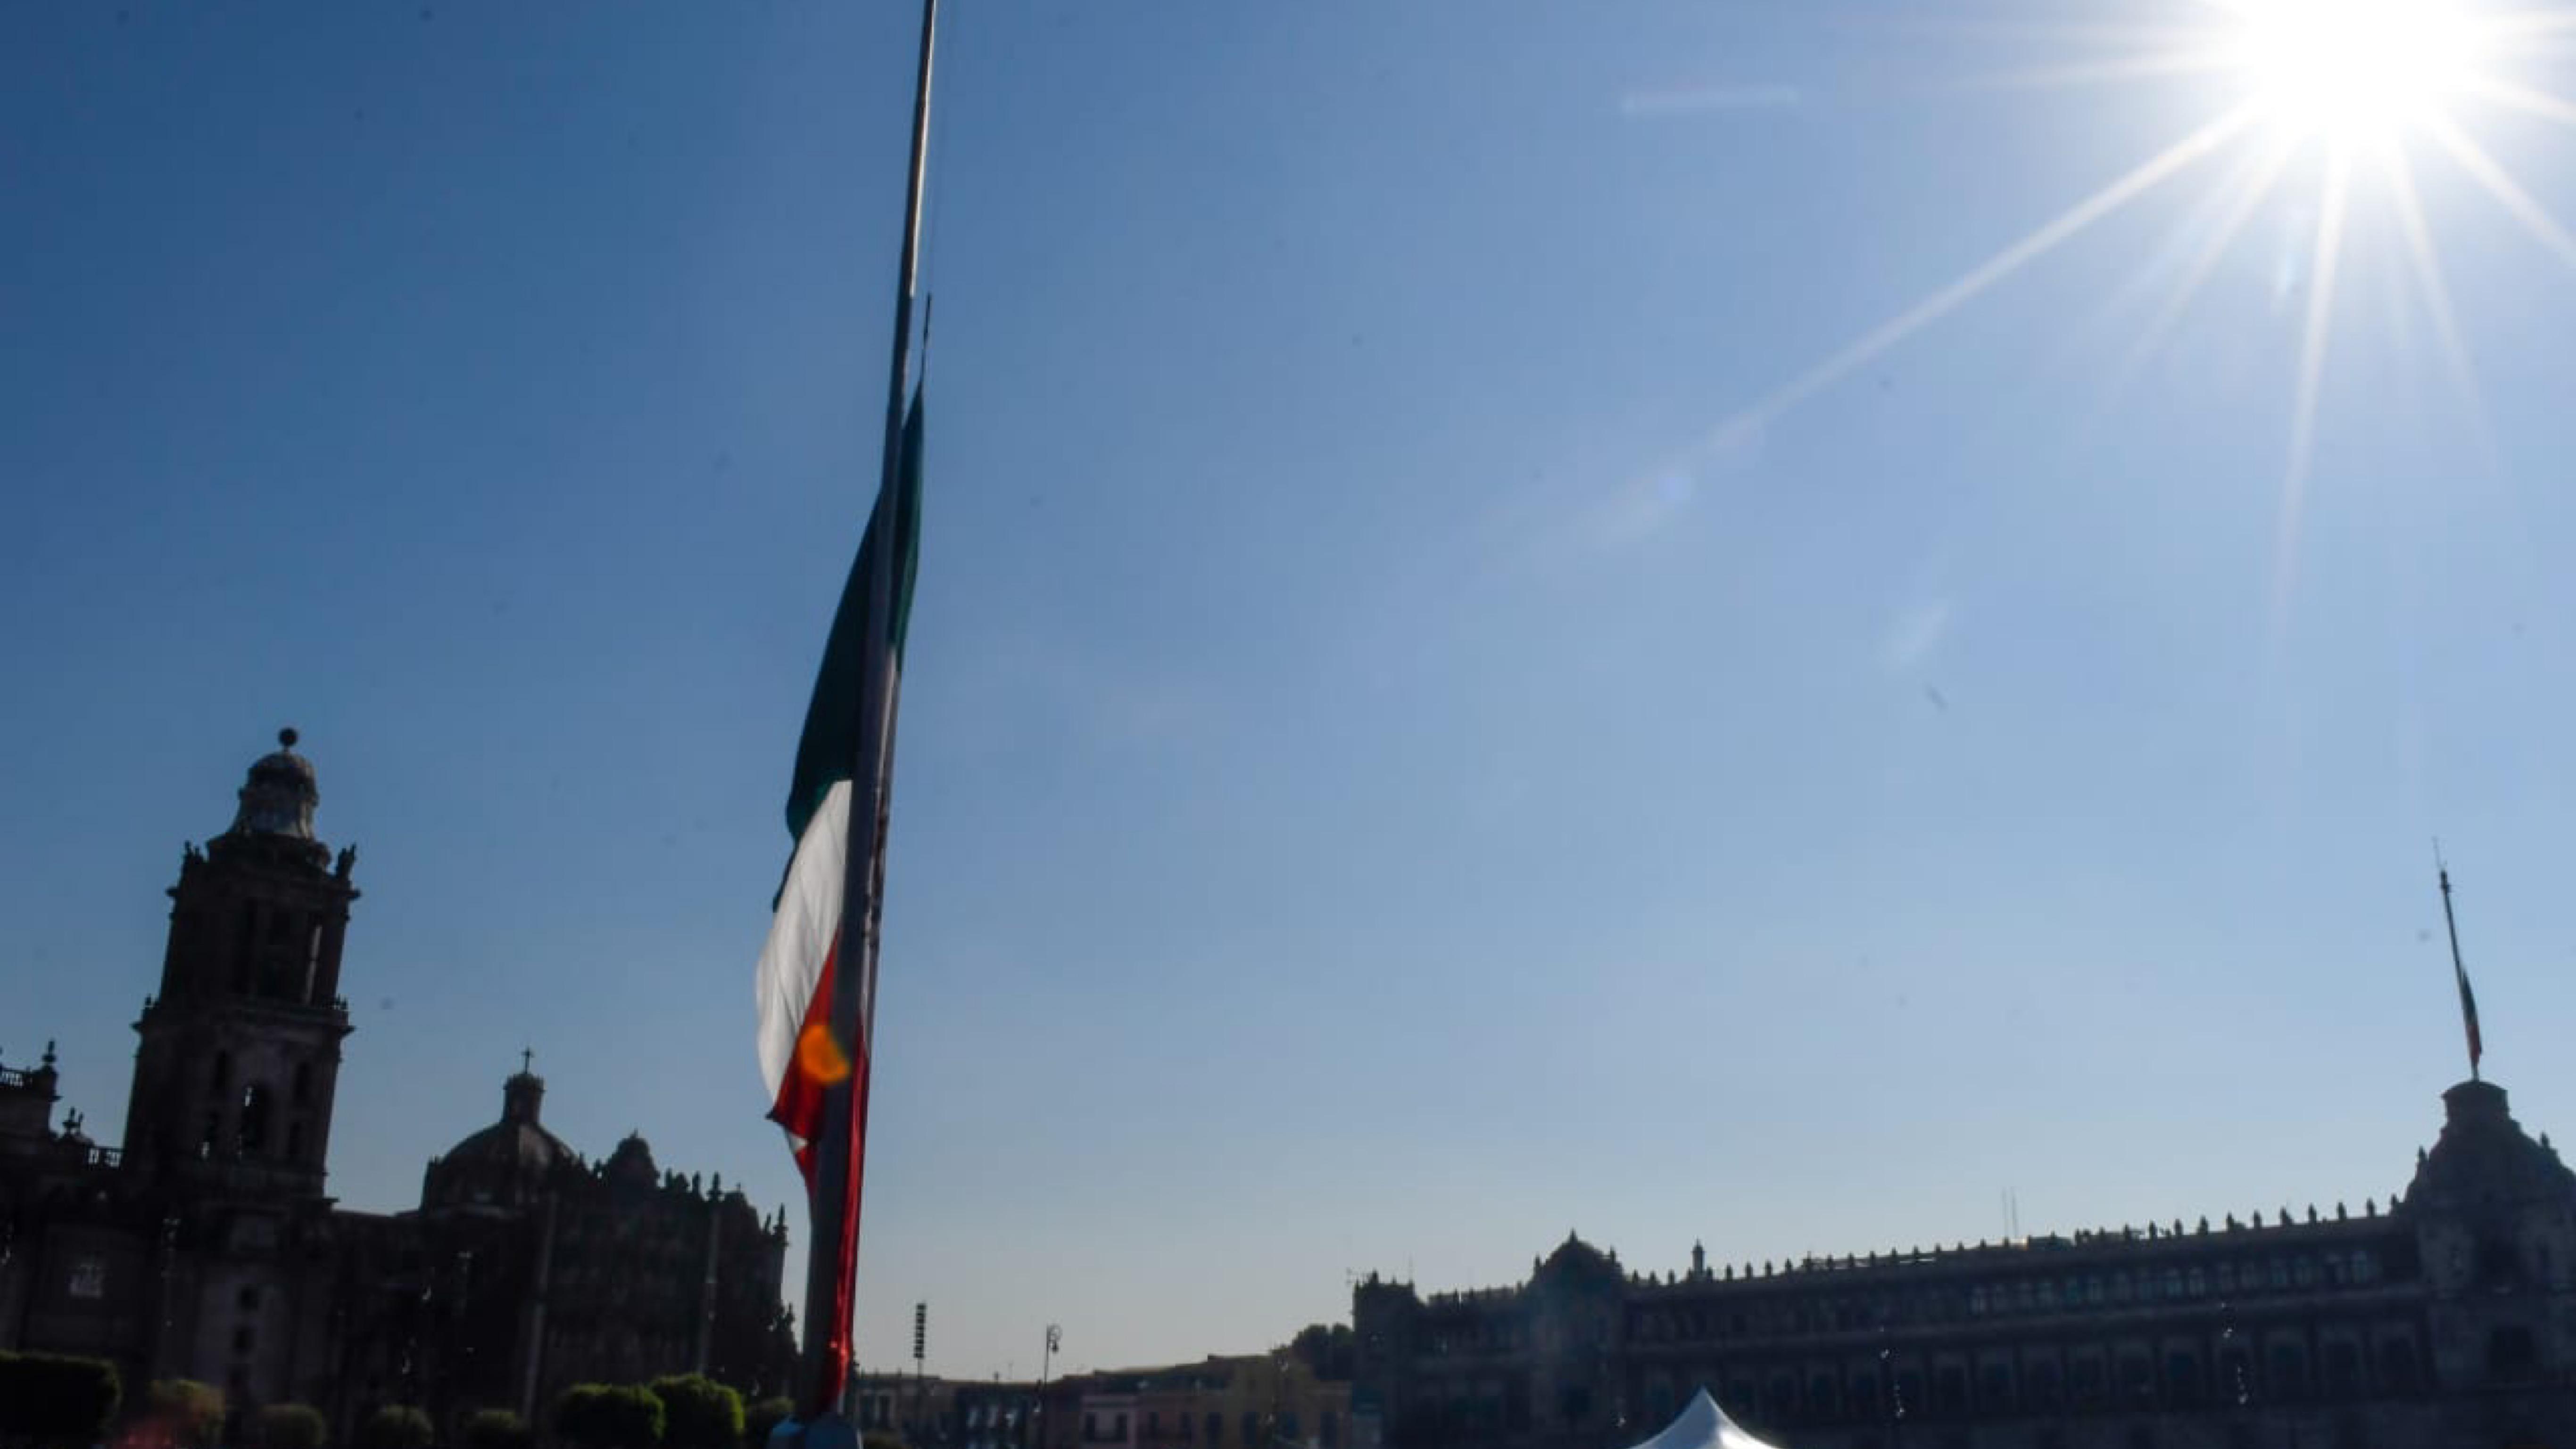 Mexico-de-luto-izan-bandera-a-media-asta-por-victimas-de-colapso